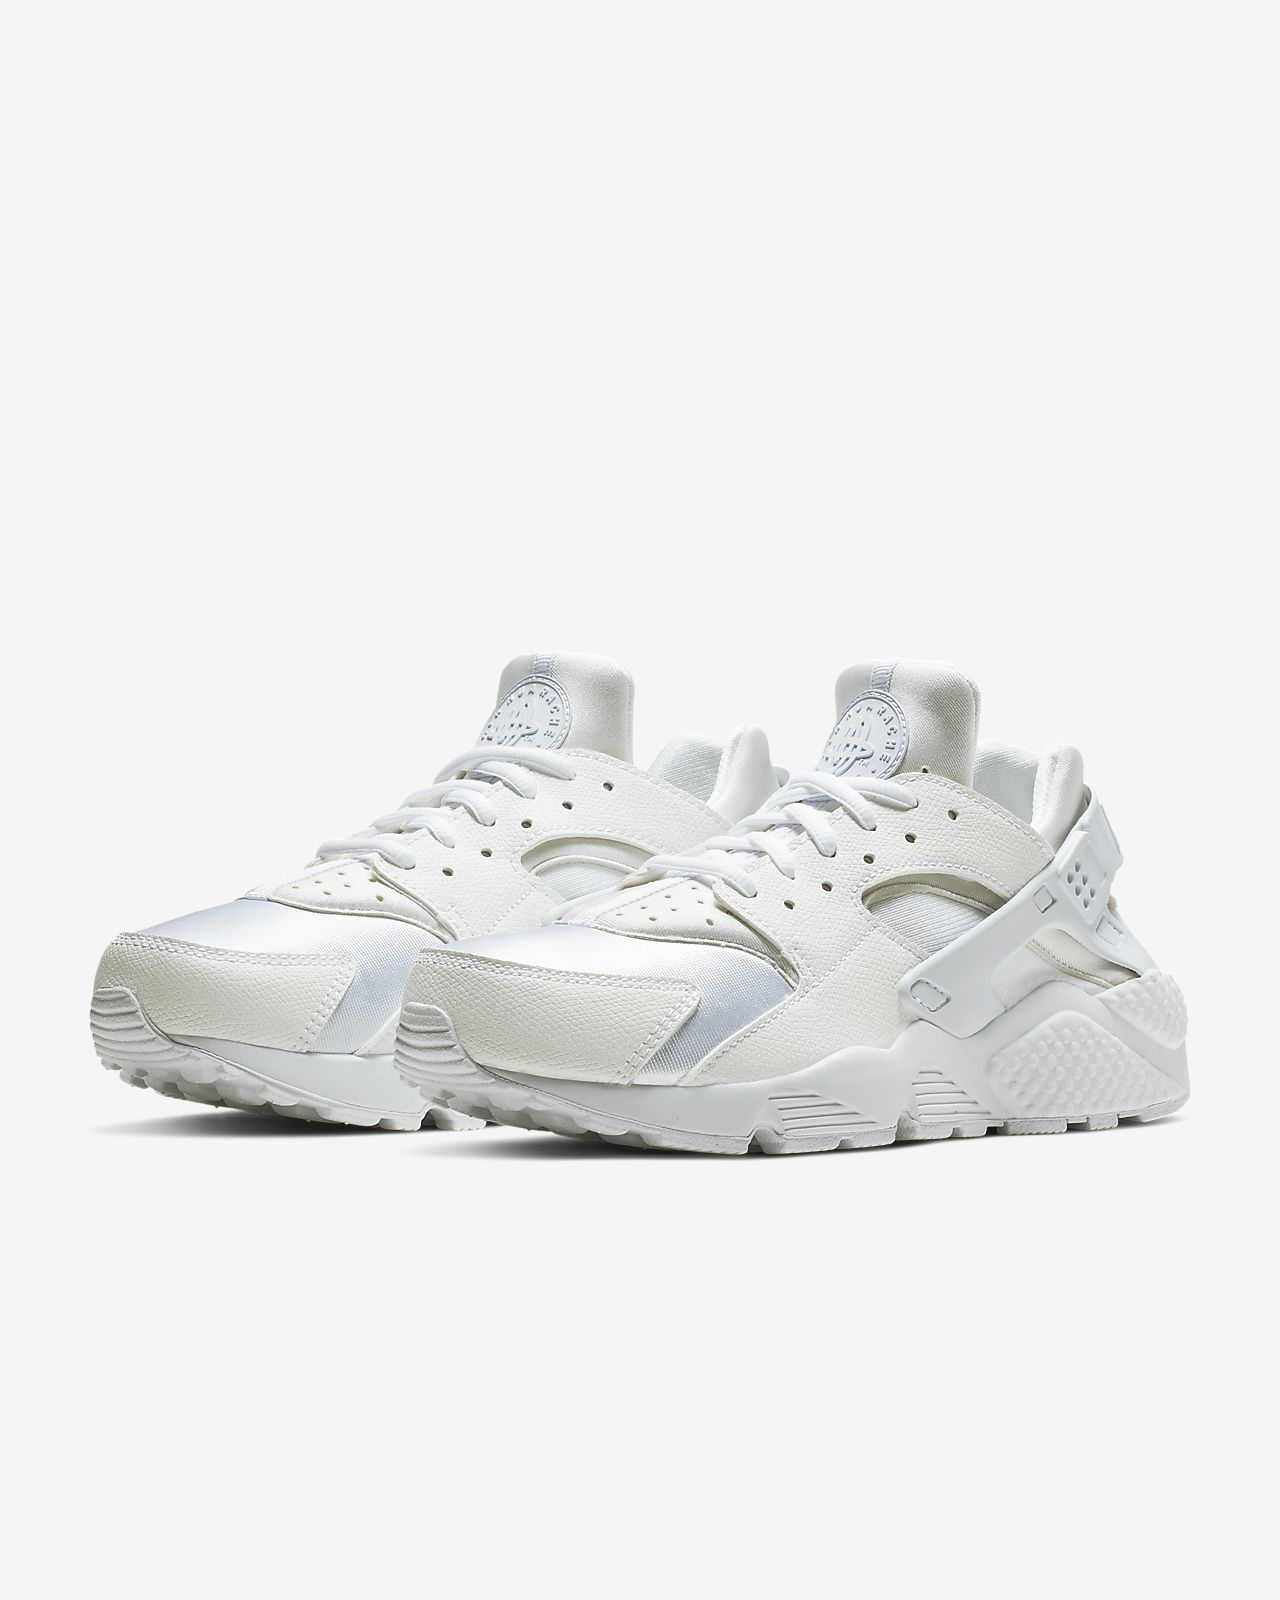 9ebf214c5d7b38 Nike Air Huarache Women s Shoe. Nike.com ZA